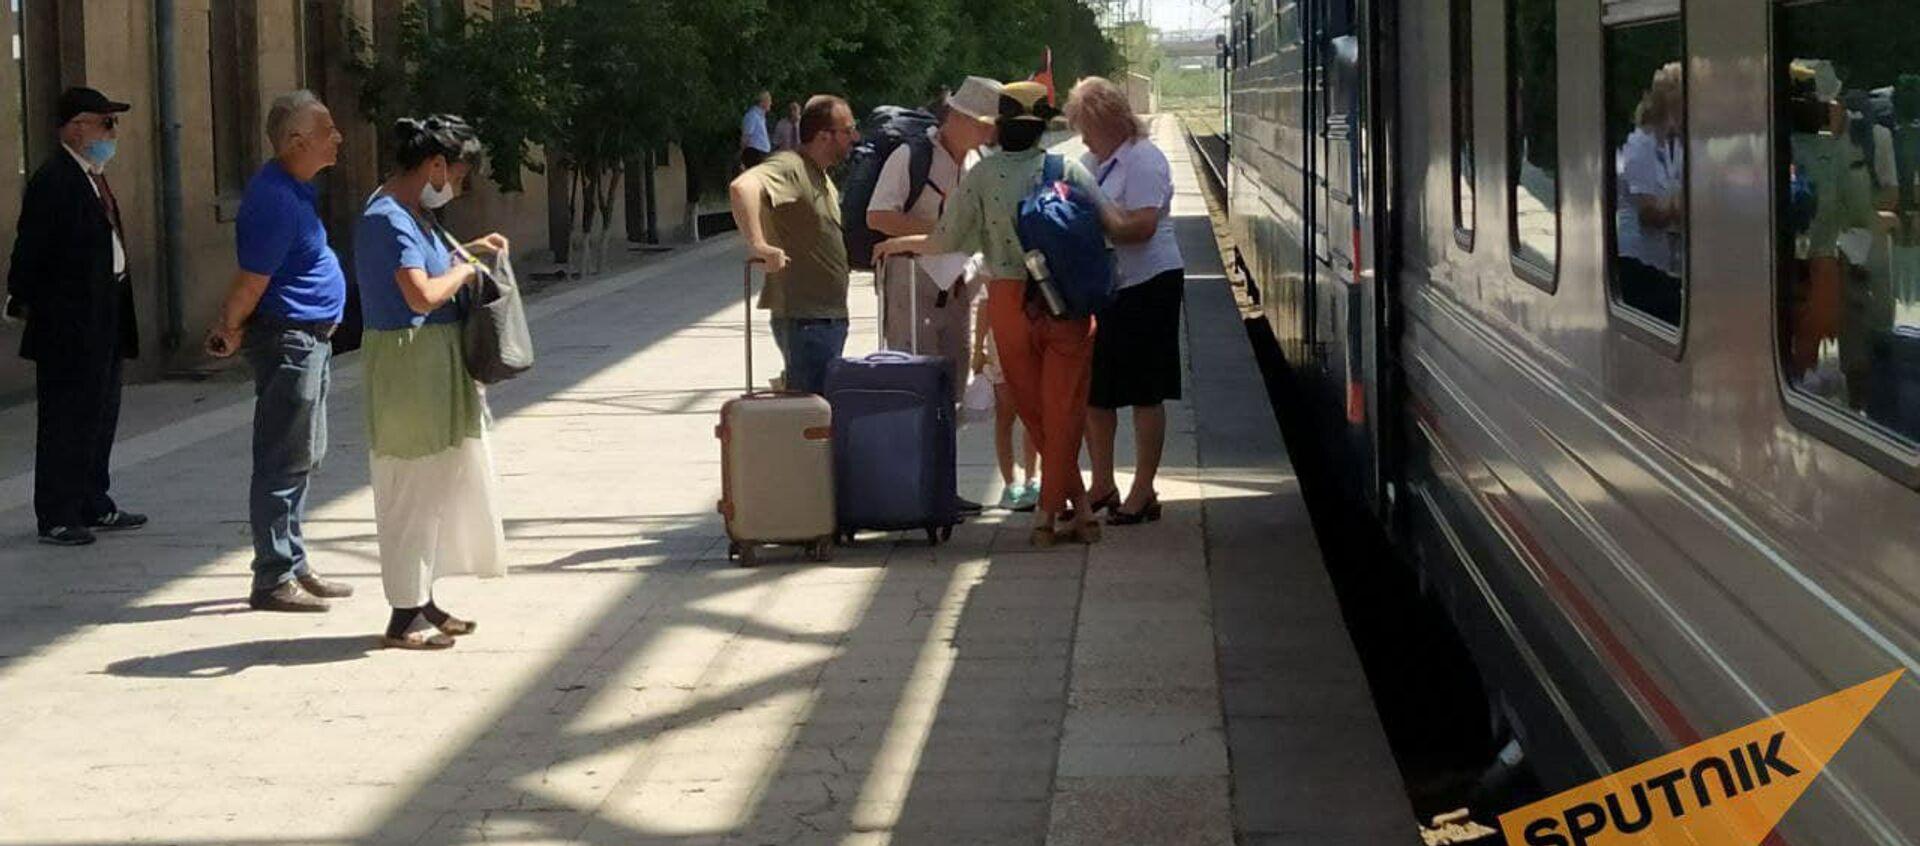 Пассажиры на перроне у поезда Ереван - Батуми - Sputnik Армения, 1920, 30.07.2021